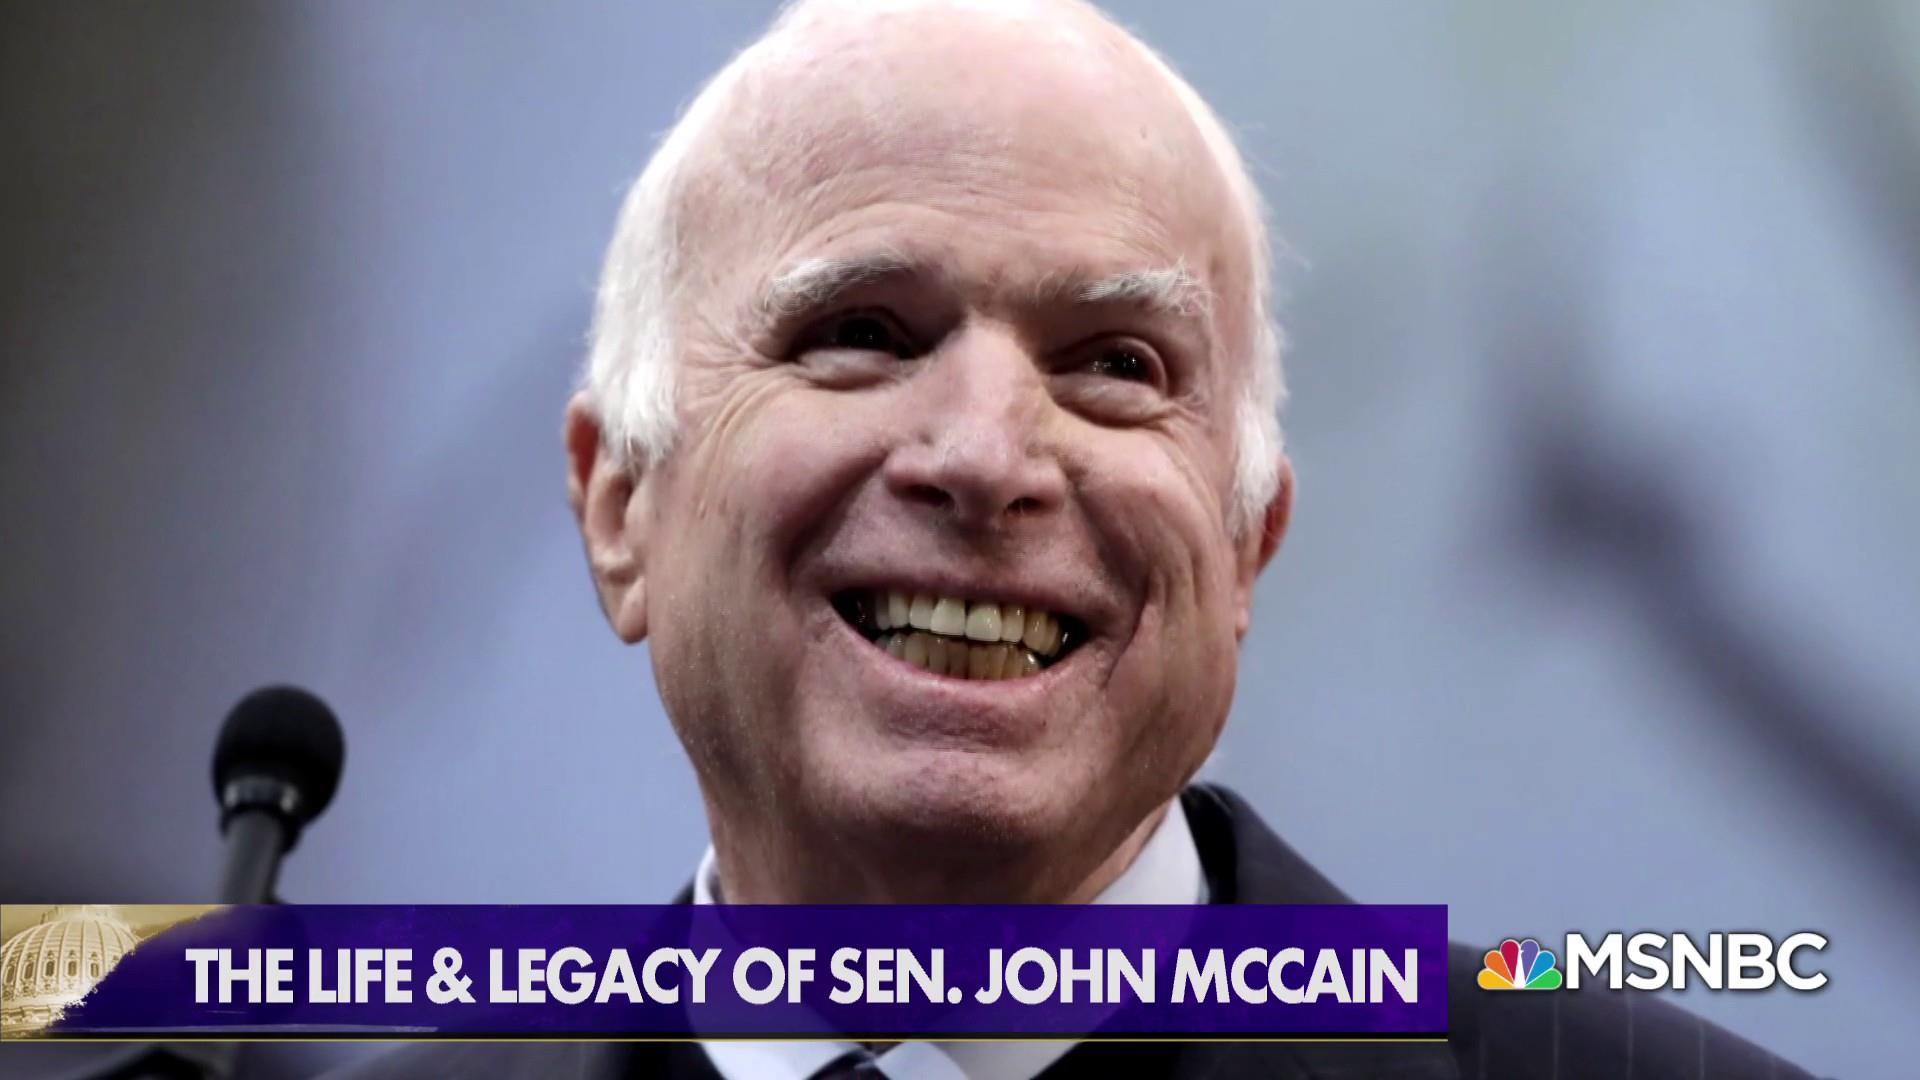 Honoring the life and legacy of Sen. John McCain